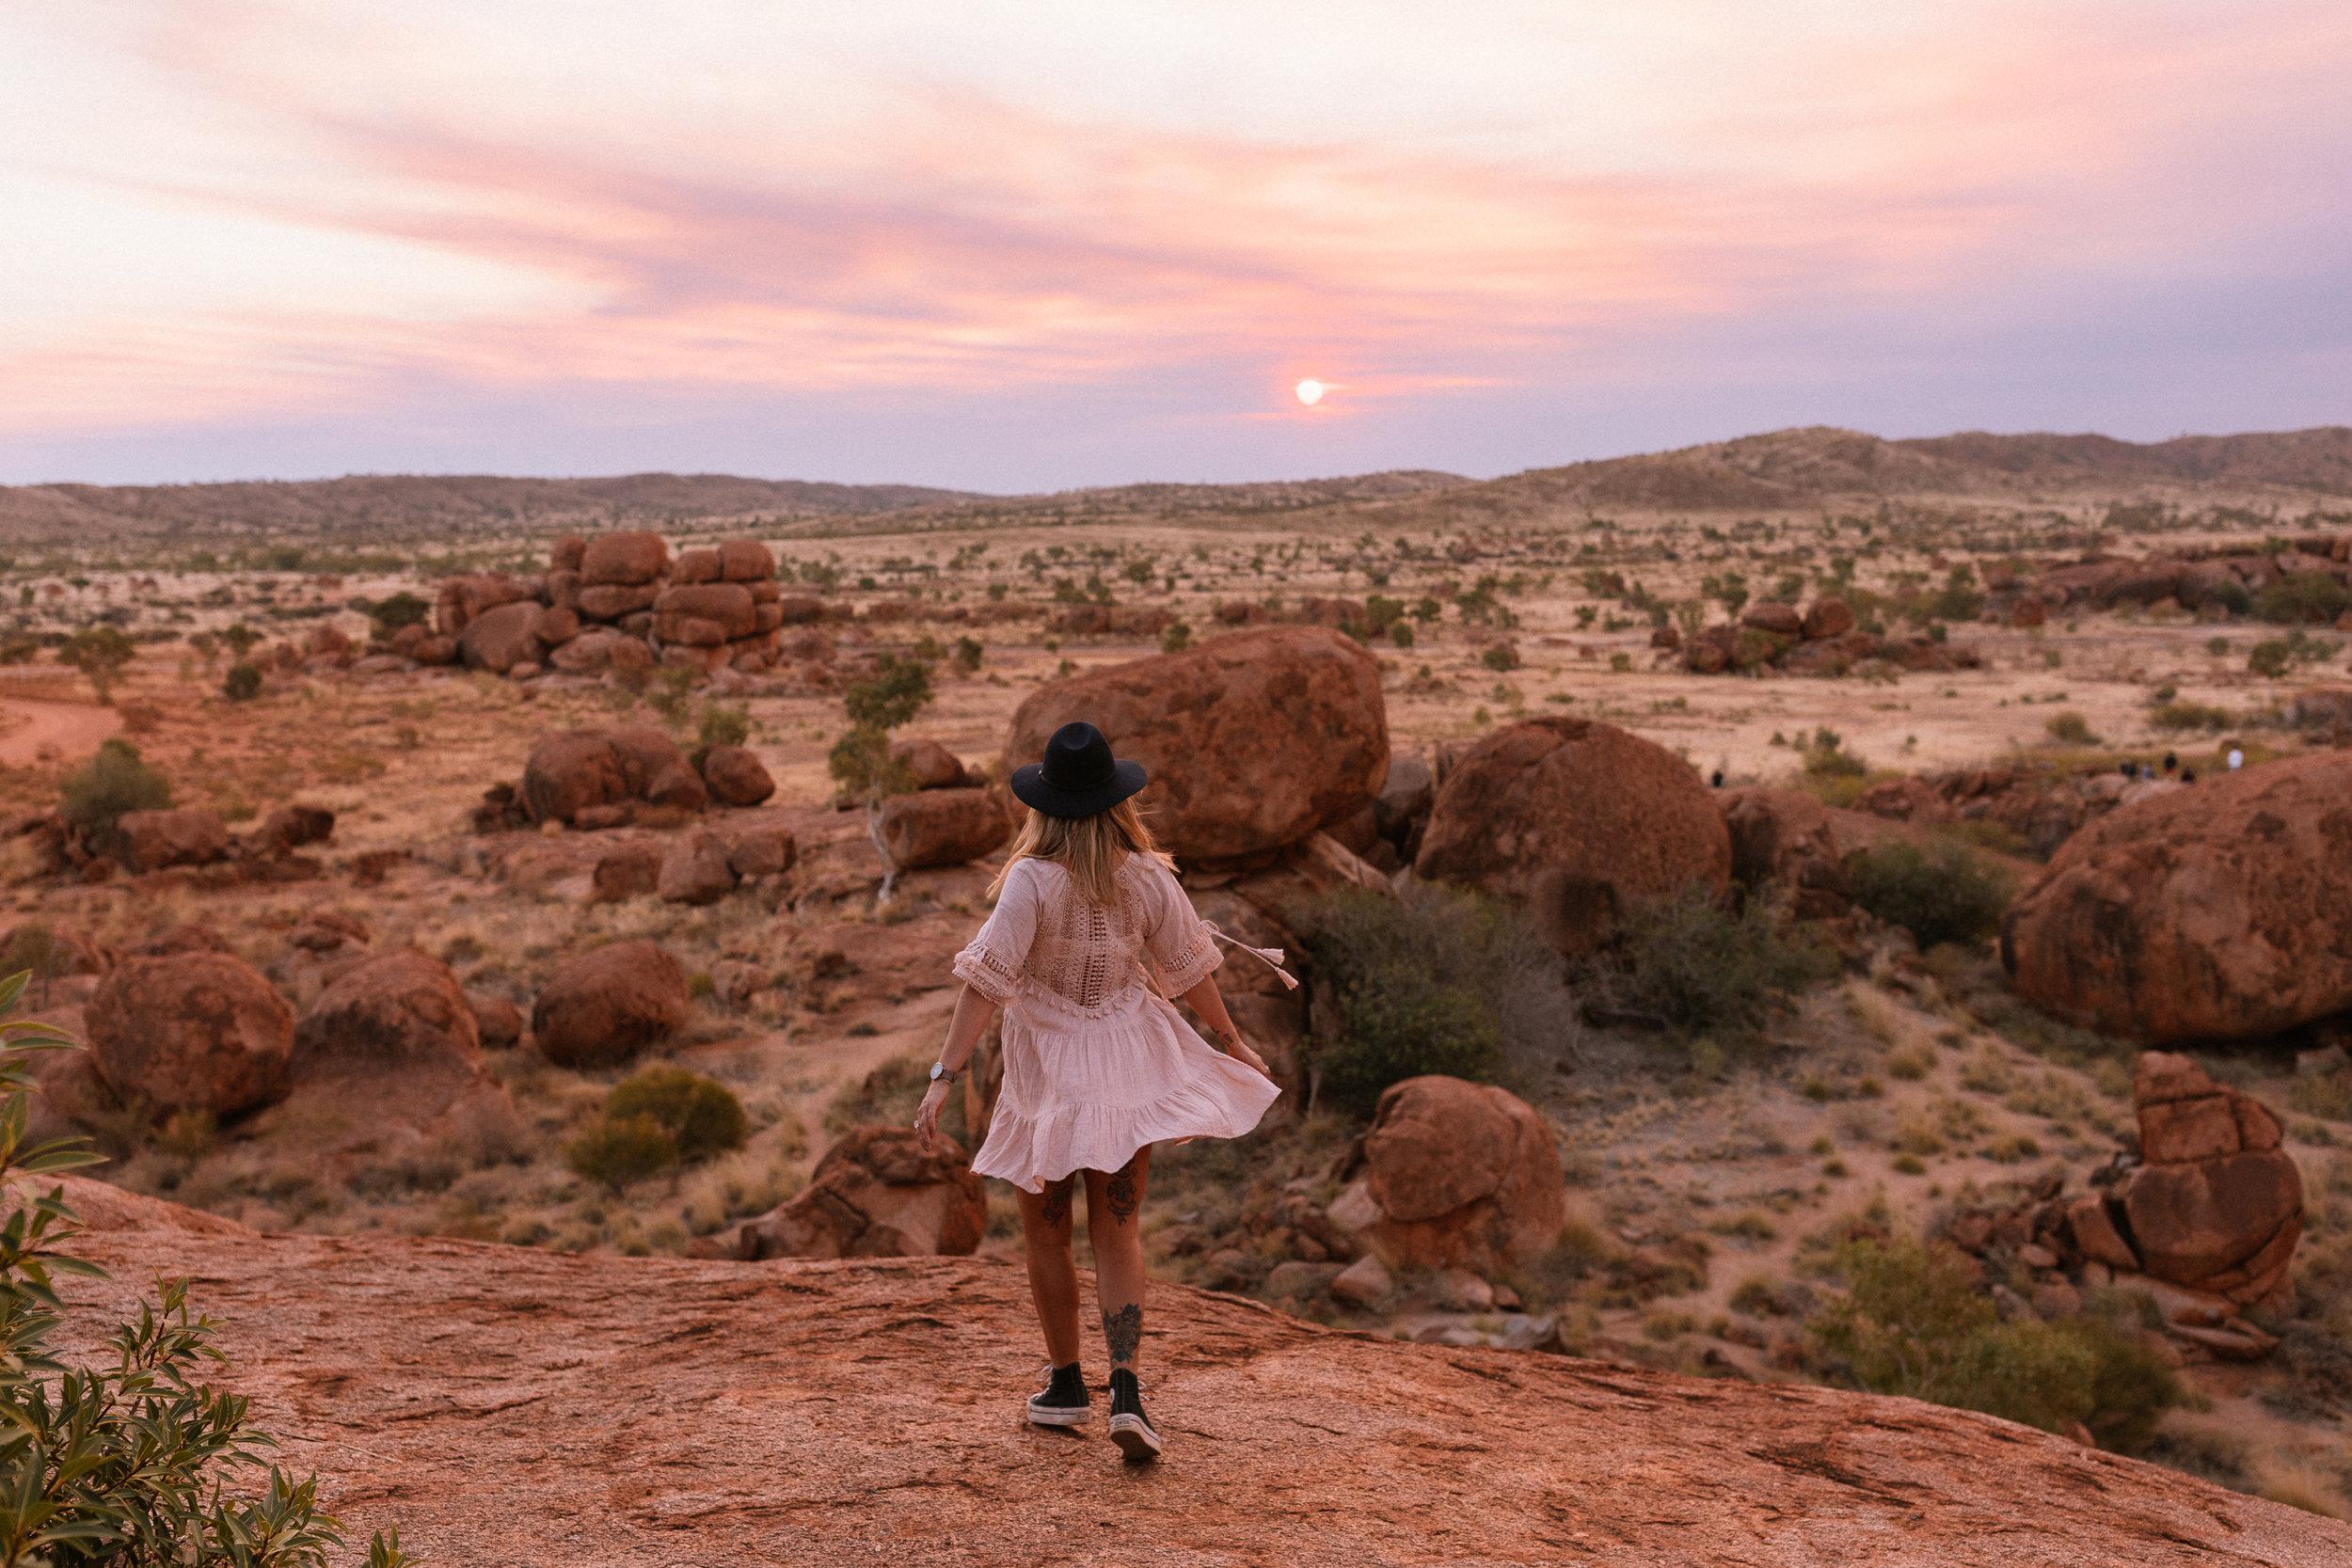 Melissa-Findley-Northern-Territory-Blog-02.jpg